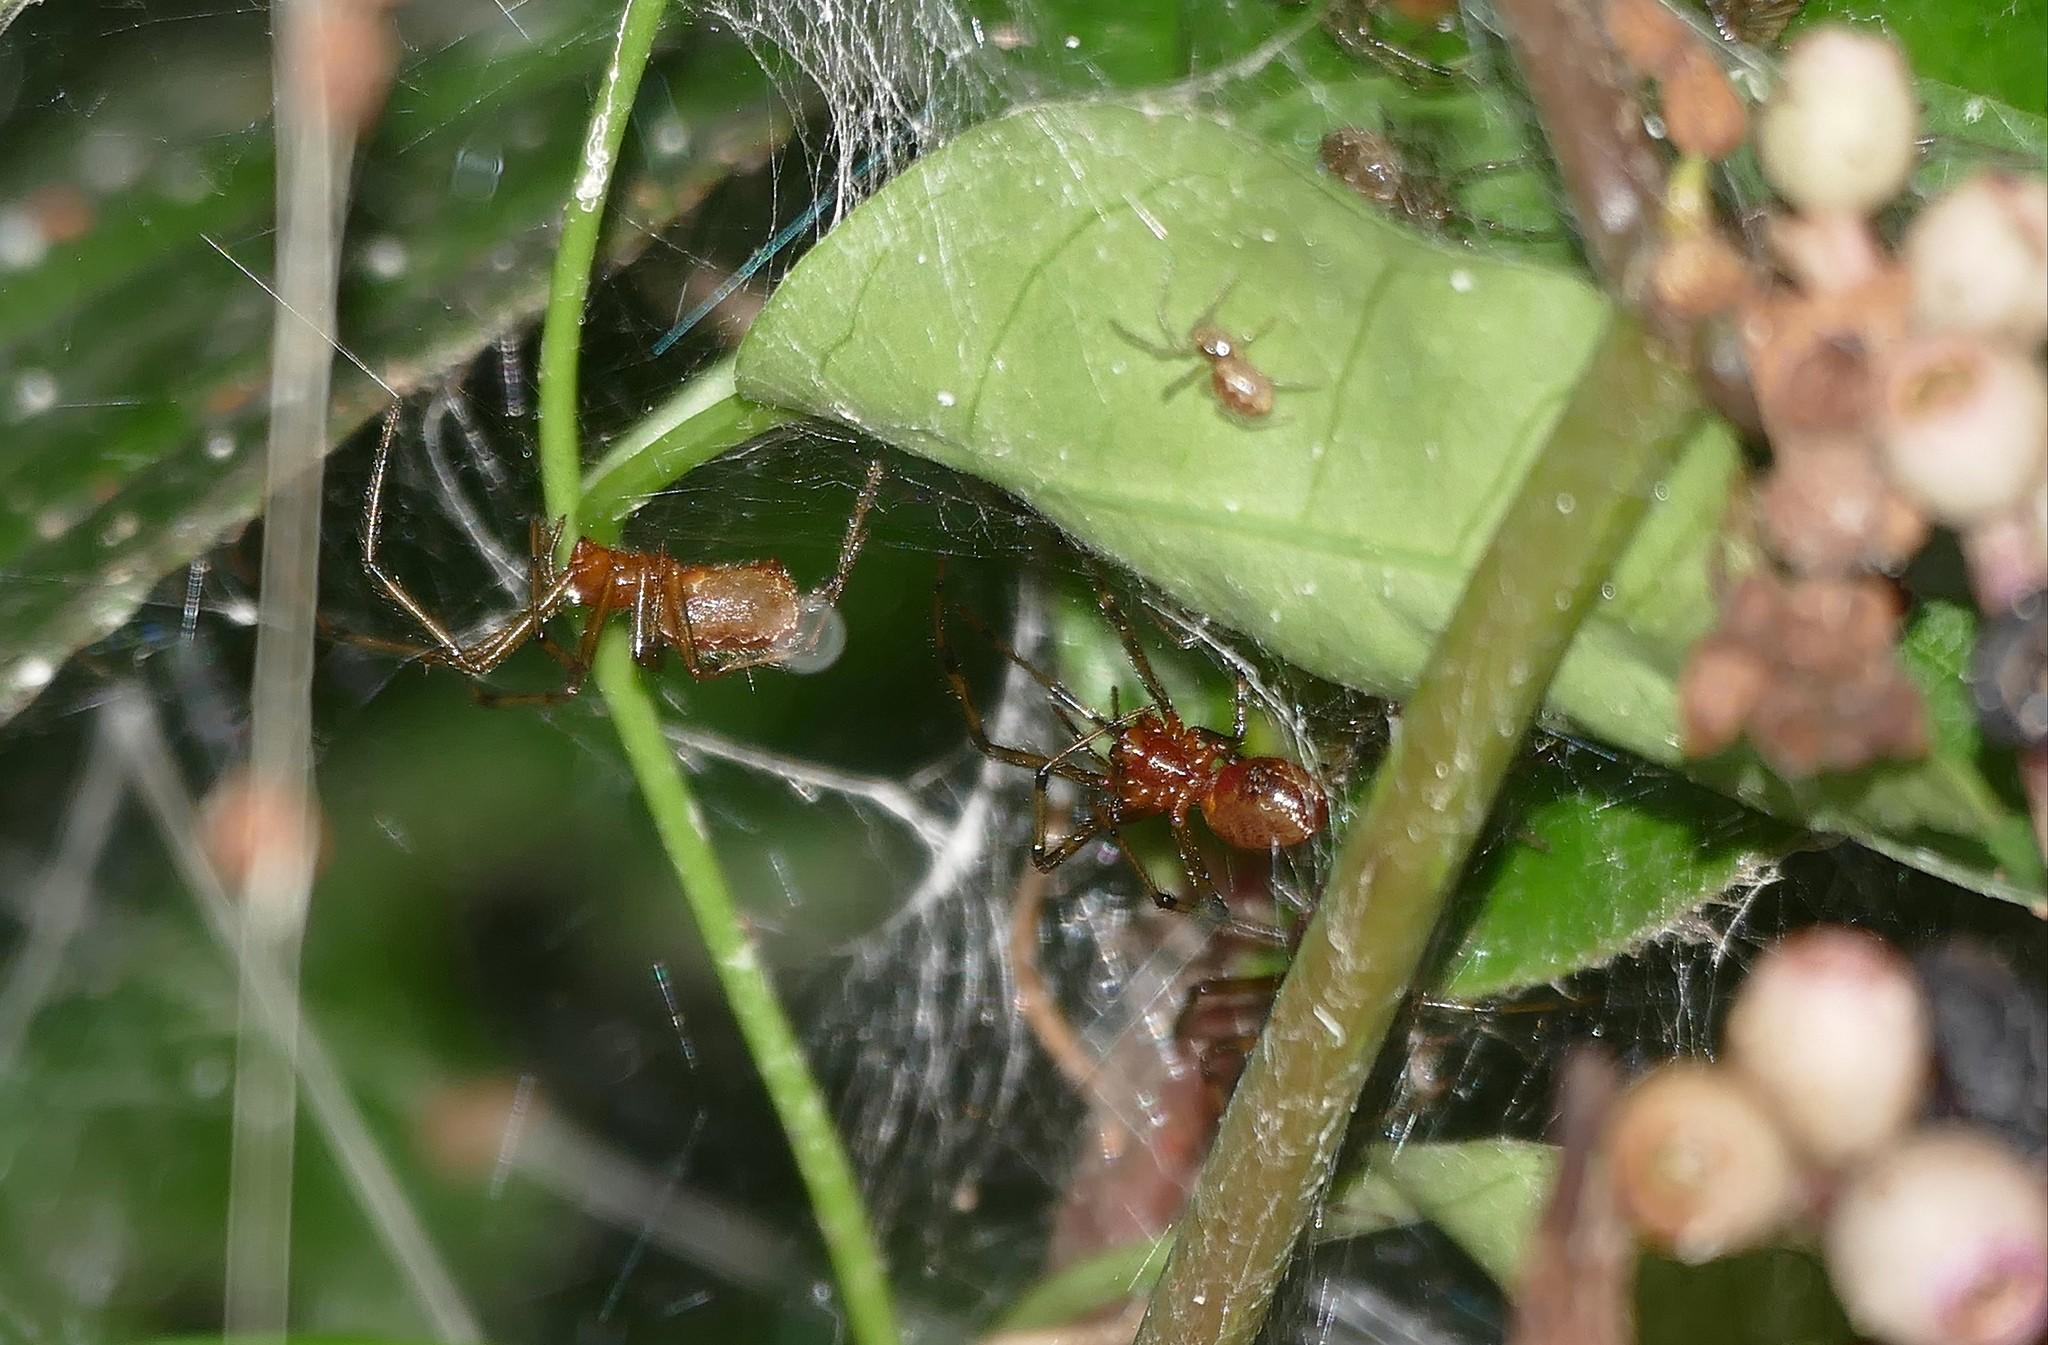 Aranhas social Anelosimus eximius (Foto: Flickr/Bernard Dupont/Creative Commons)